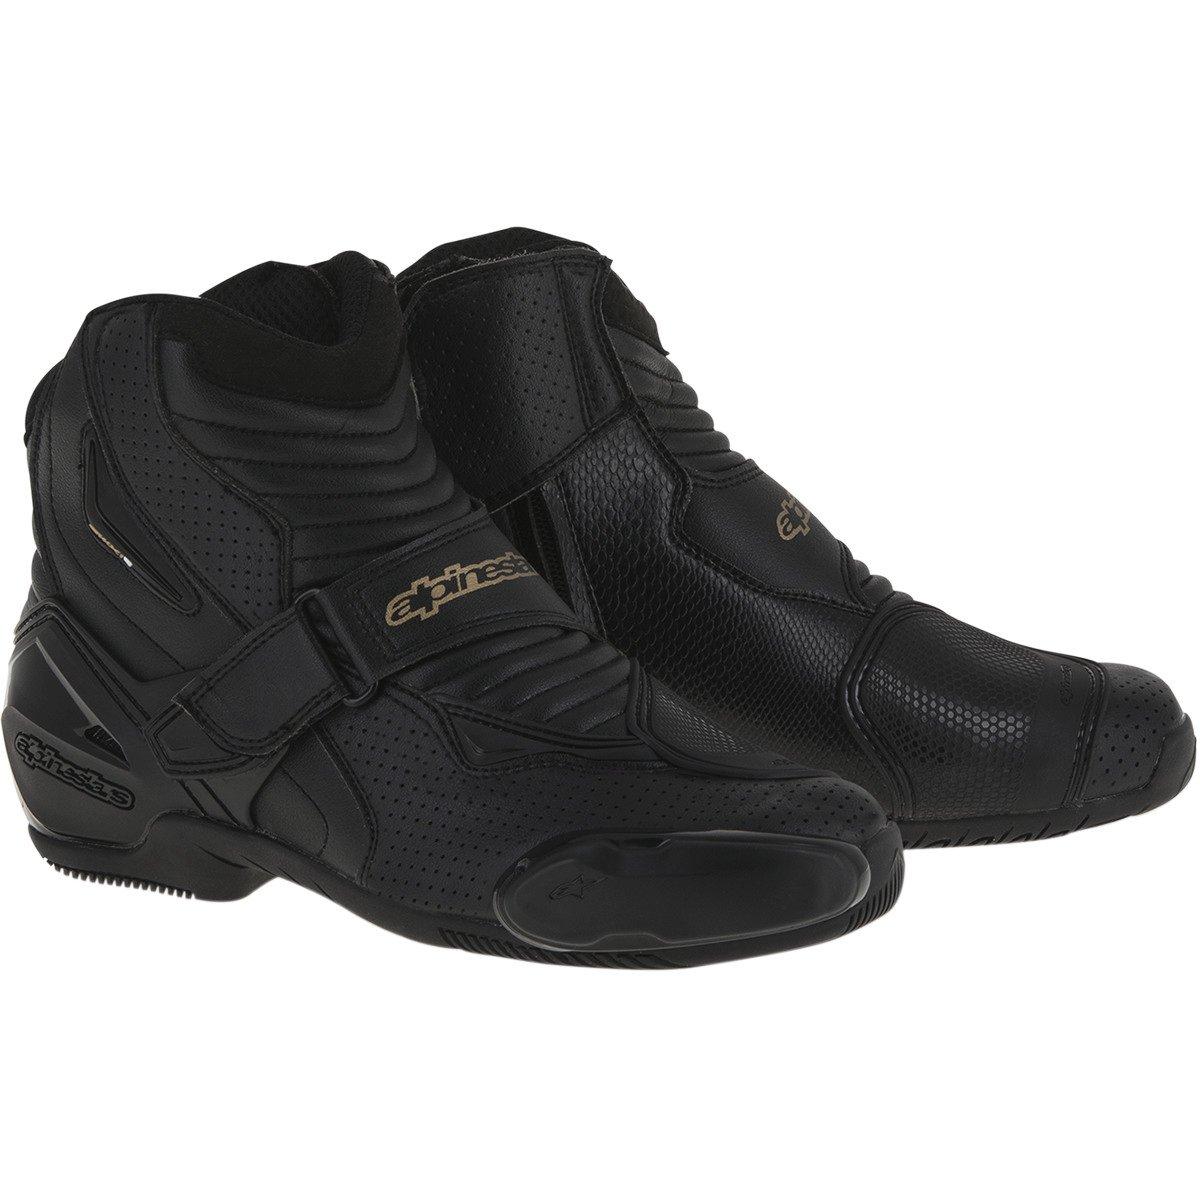 Alpinestars SMX-1R Vented Women's Street Motorcycle Boots - Black/Gold / 41